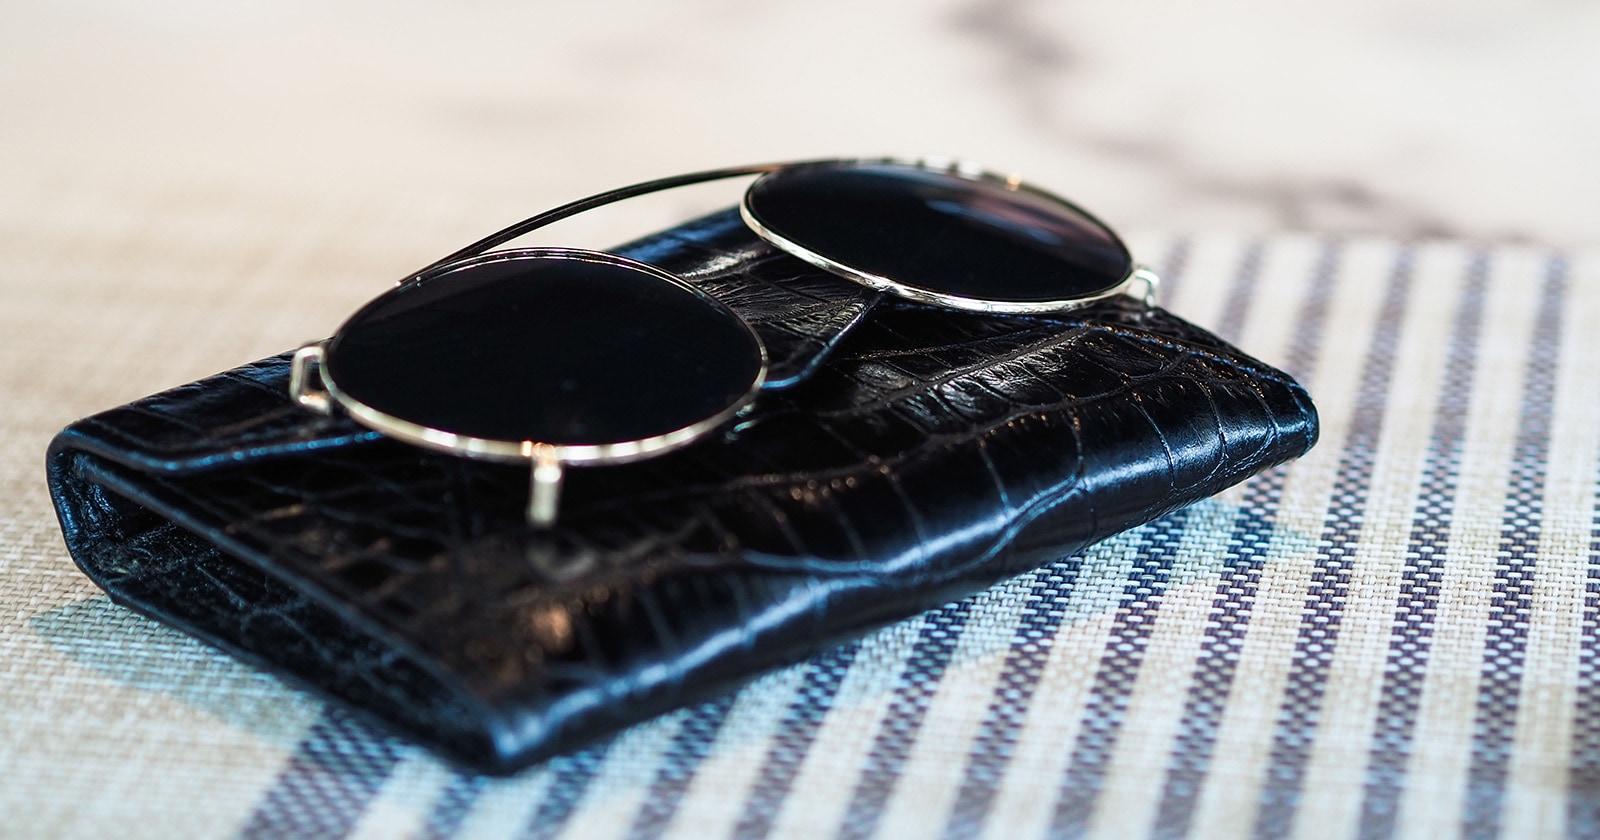 A set of clip-on sunglasses on a black case